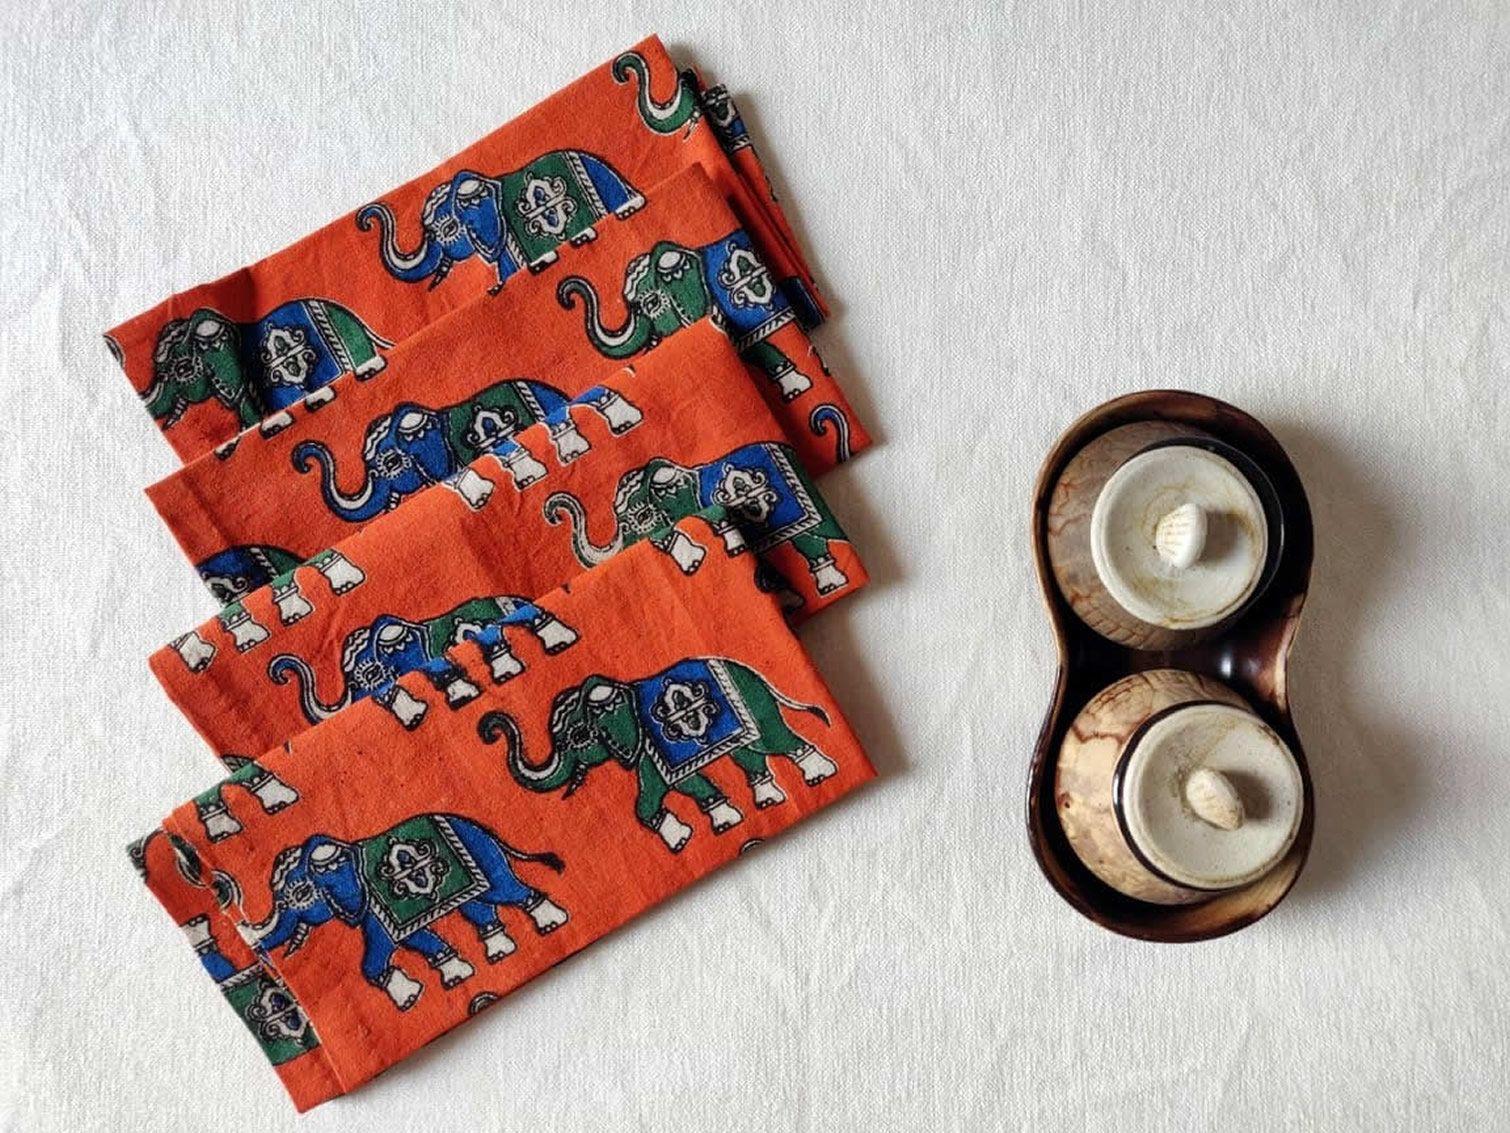 Elephant block print dinner napkin Set of 4 cotton table napkins hostess gifts, southwestern napkins, cloth napkins, Indian style theme #clothnapkins